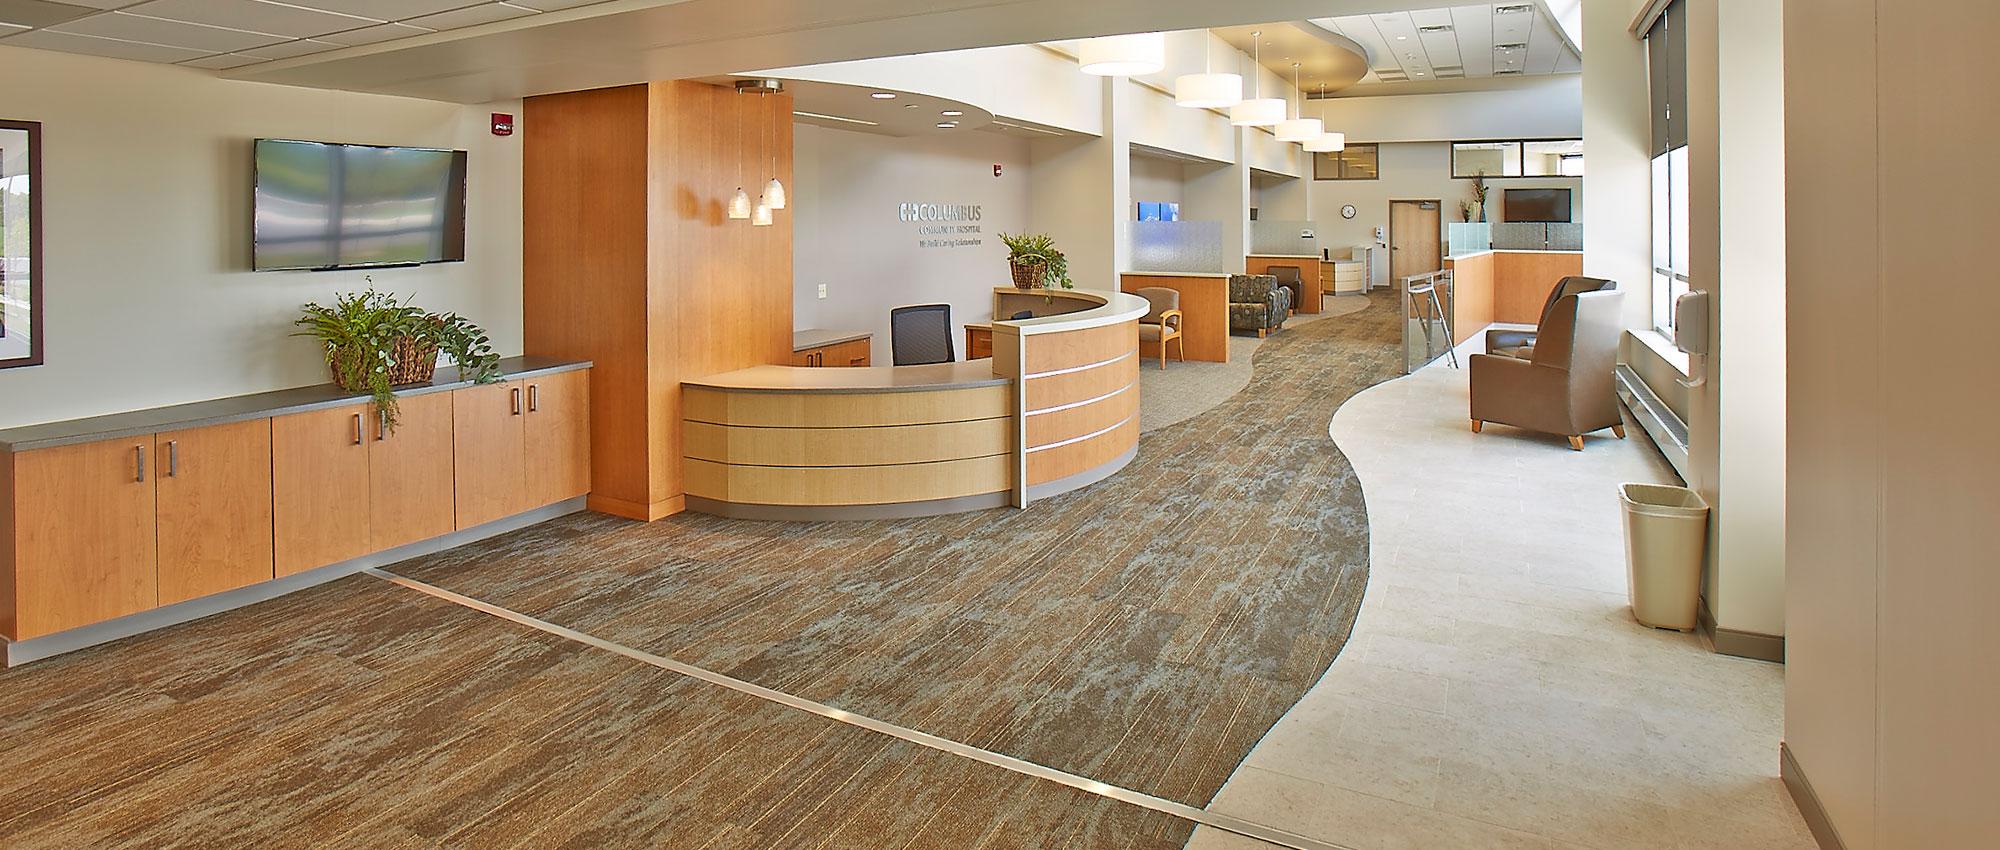 Healthcare-Columbus-Hospital-3